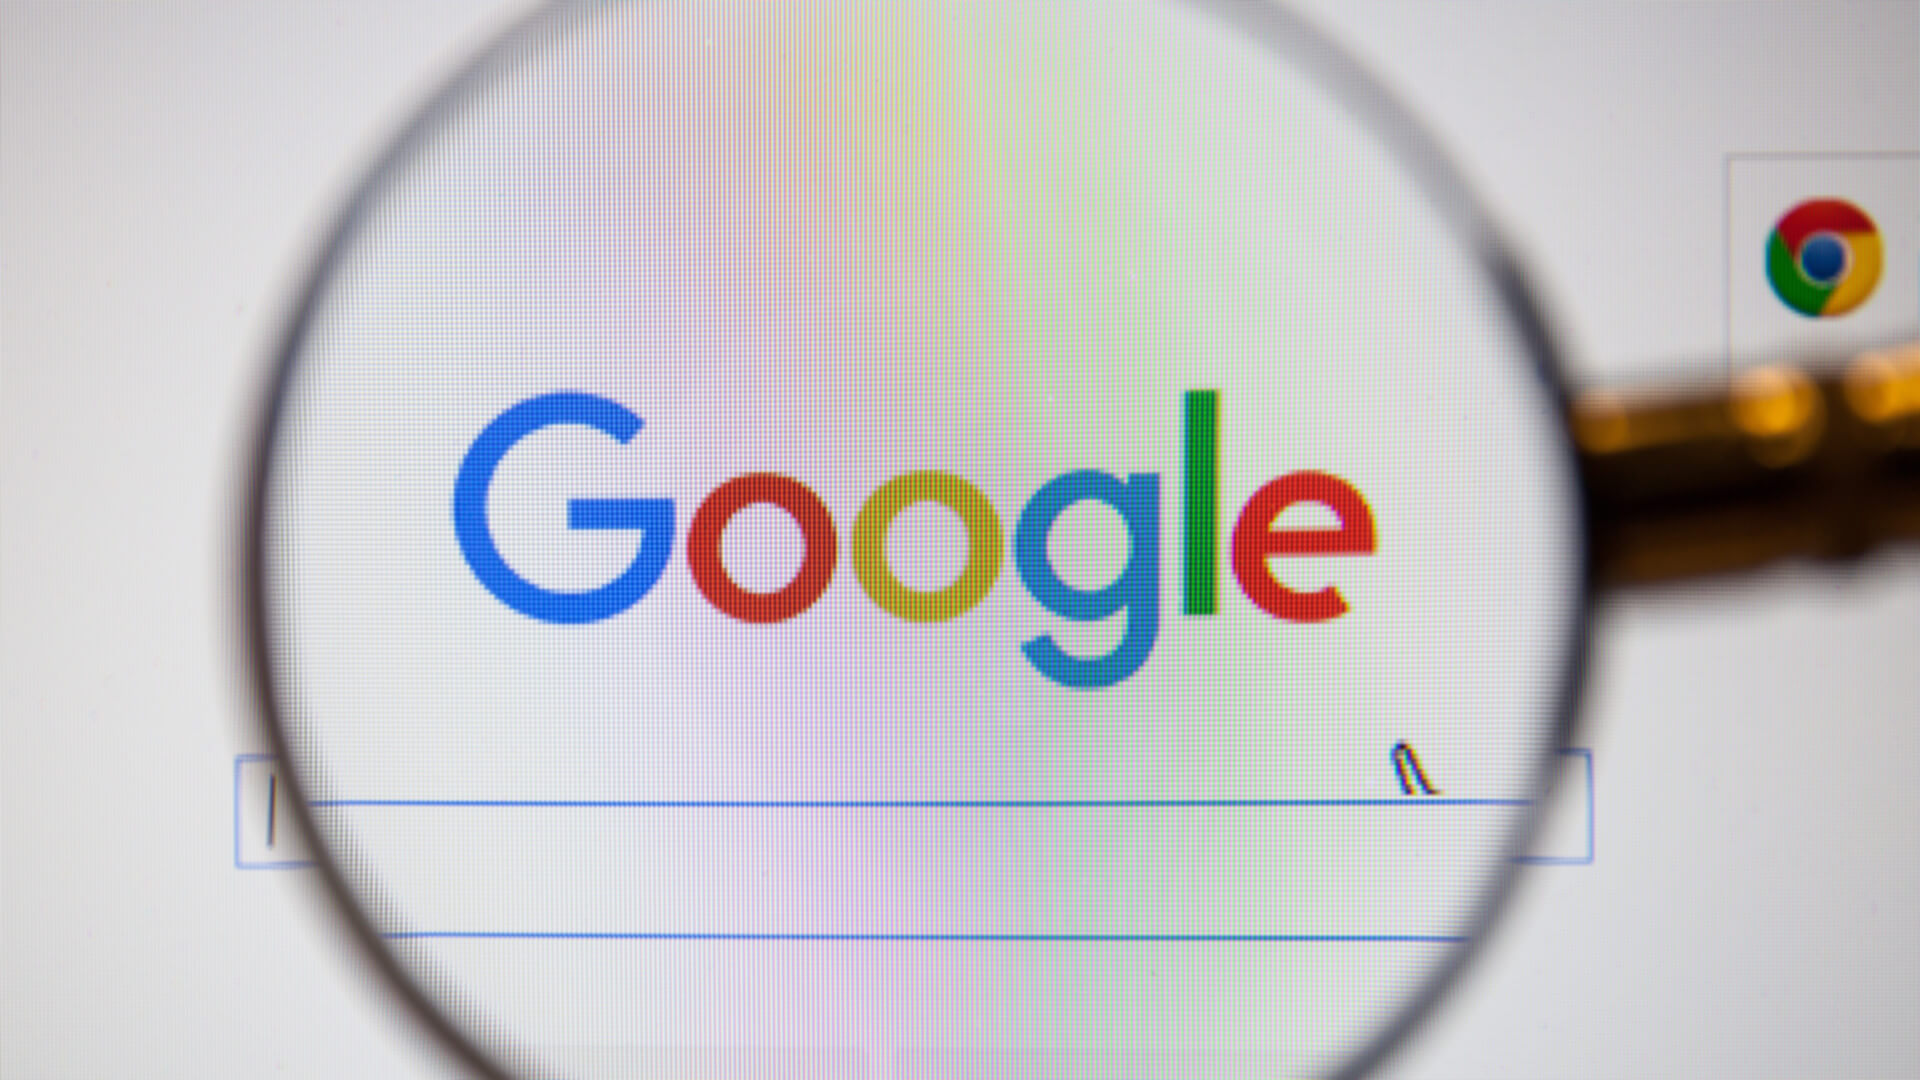 google-search-new-logo1-ss-1920